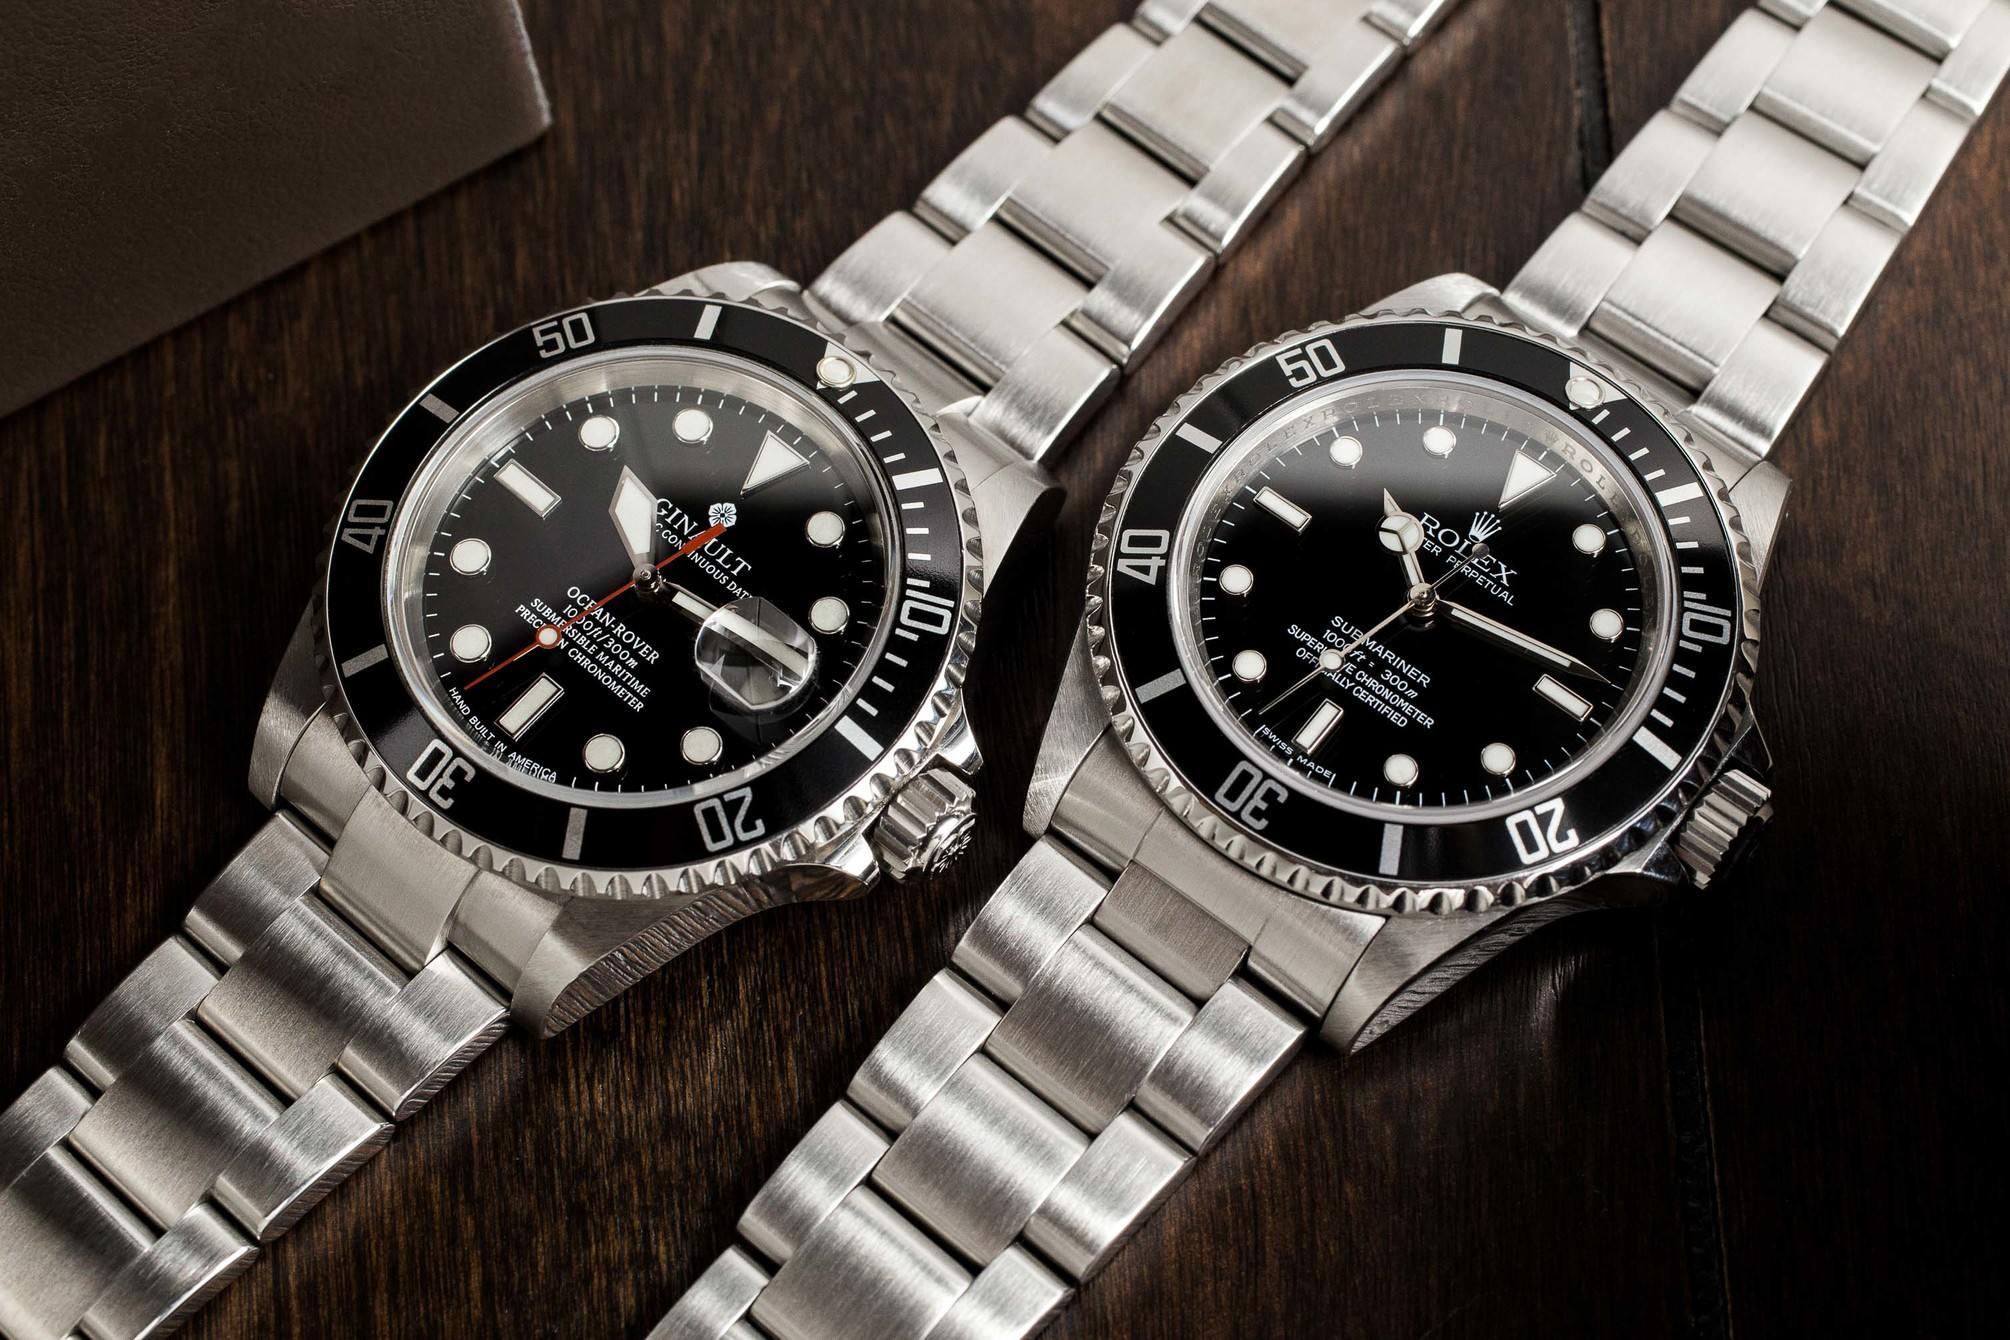 Ginault Ocean Rover vs Rolex Submariner 2